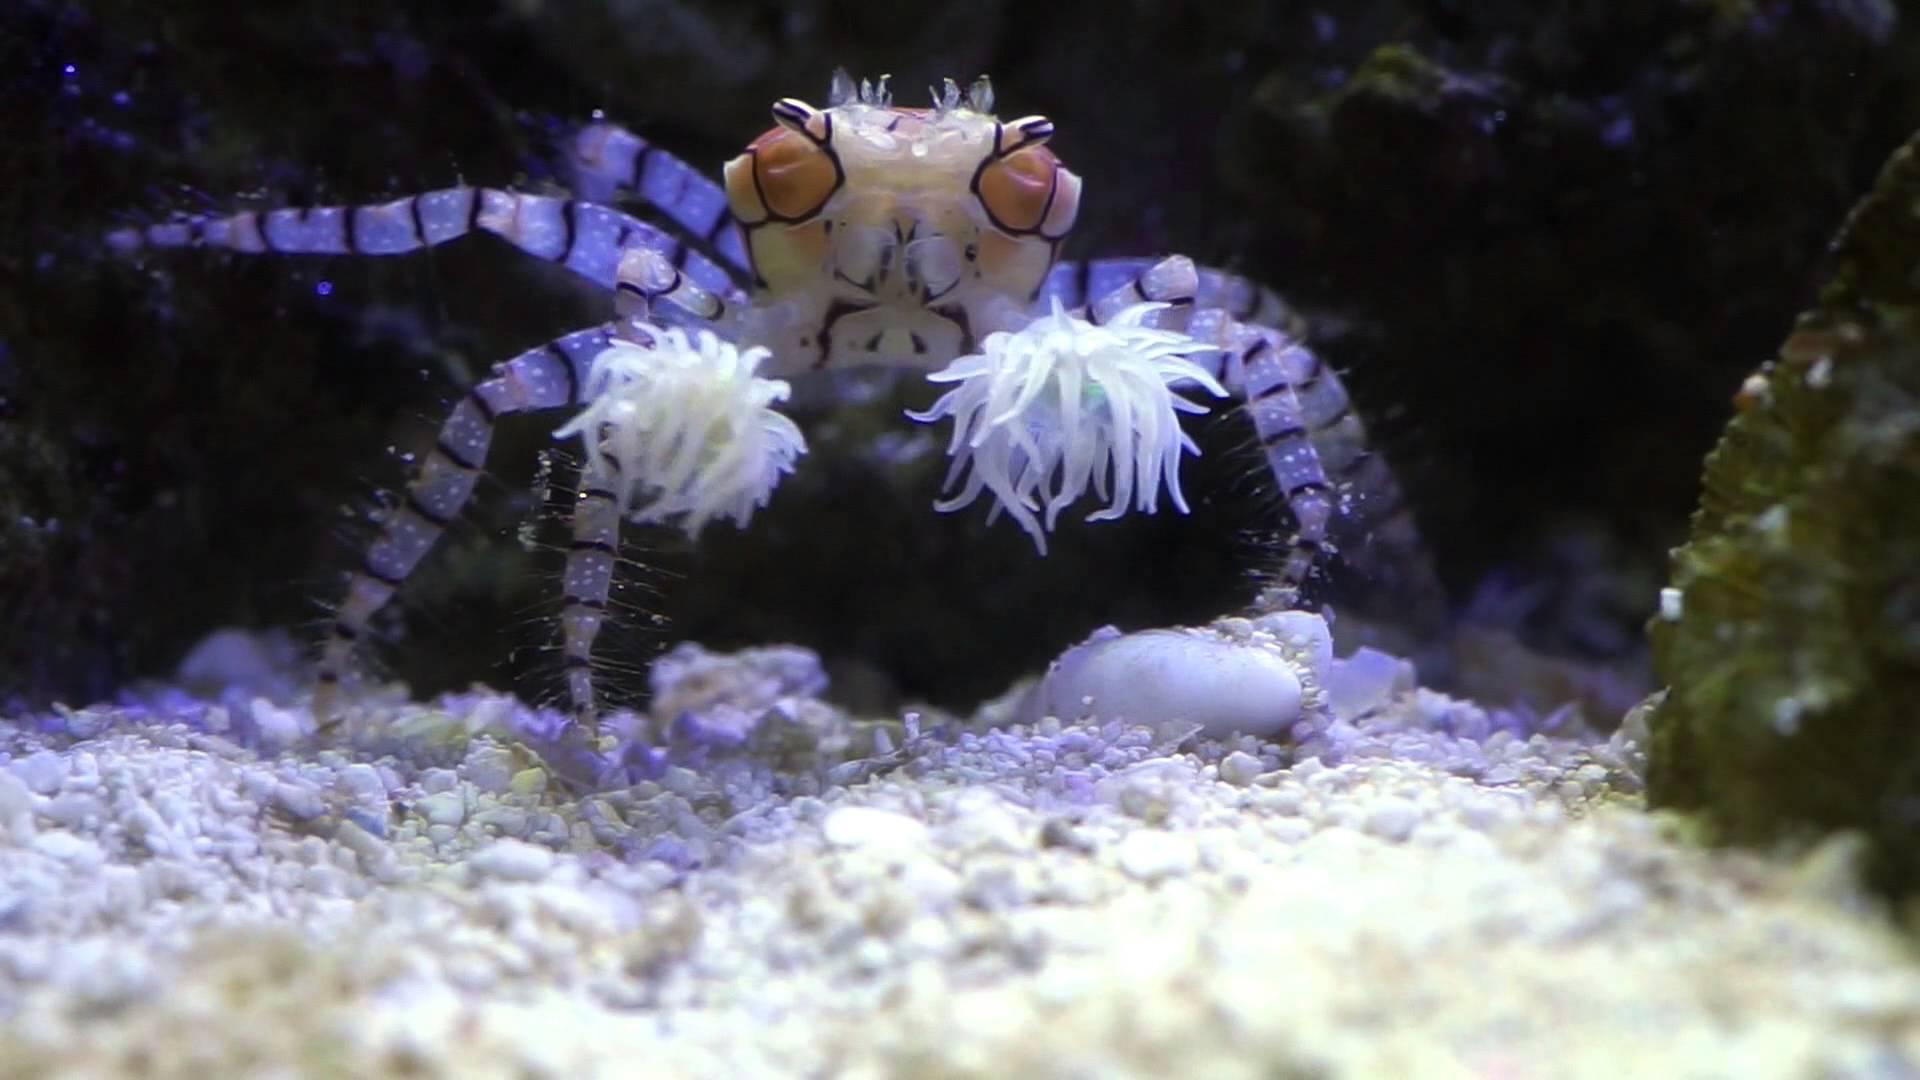 kepiting pom-pom-binatang imut